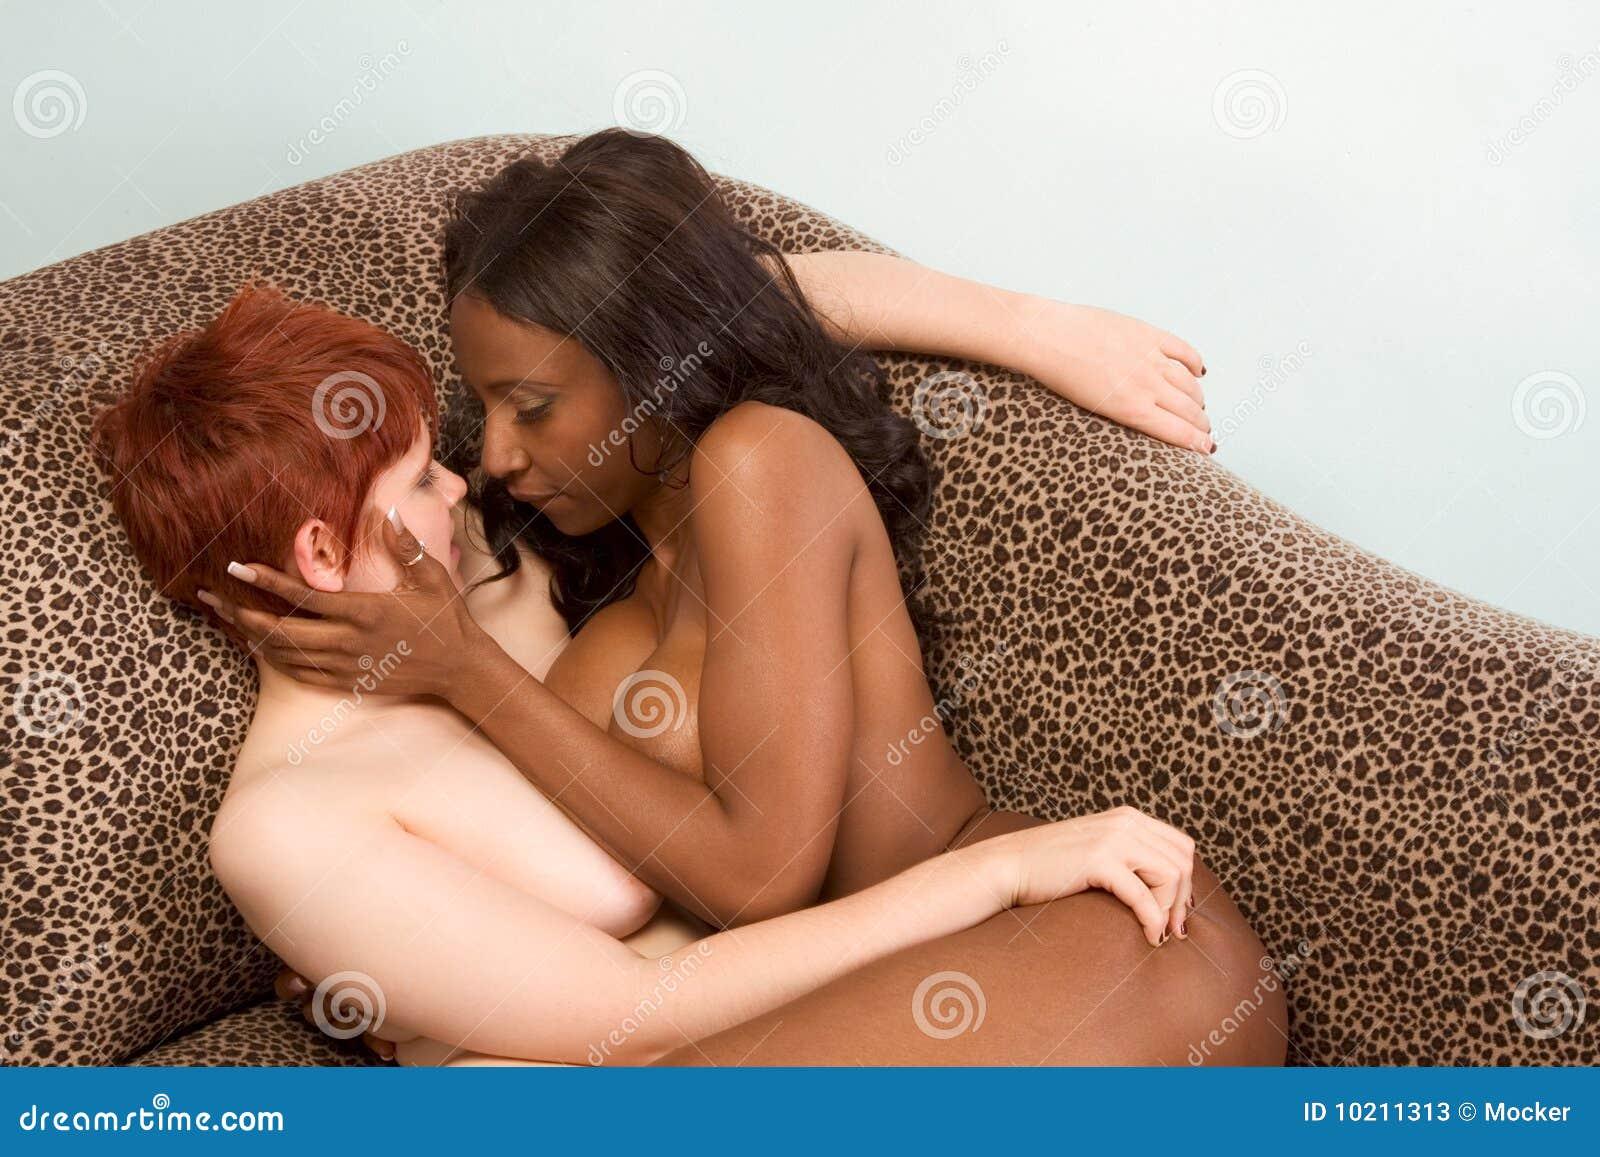 Naked Lesbian Couples 29